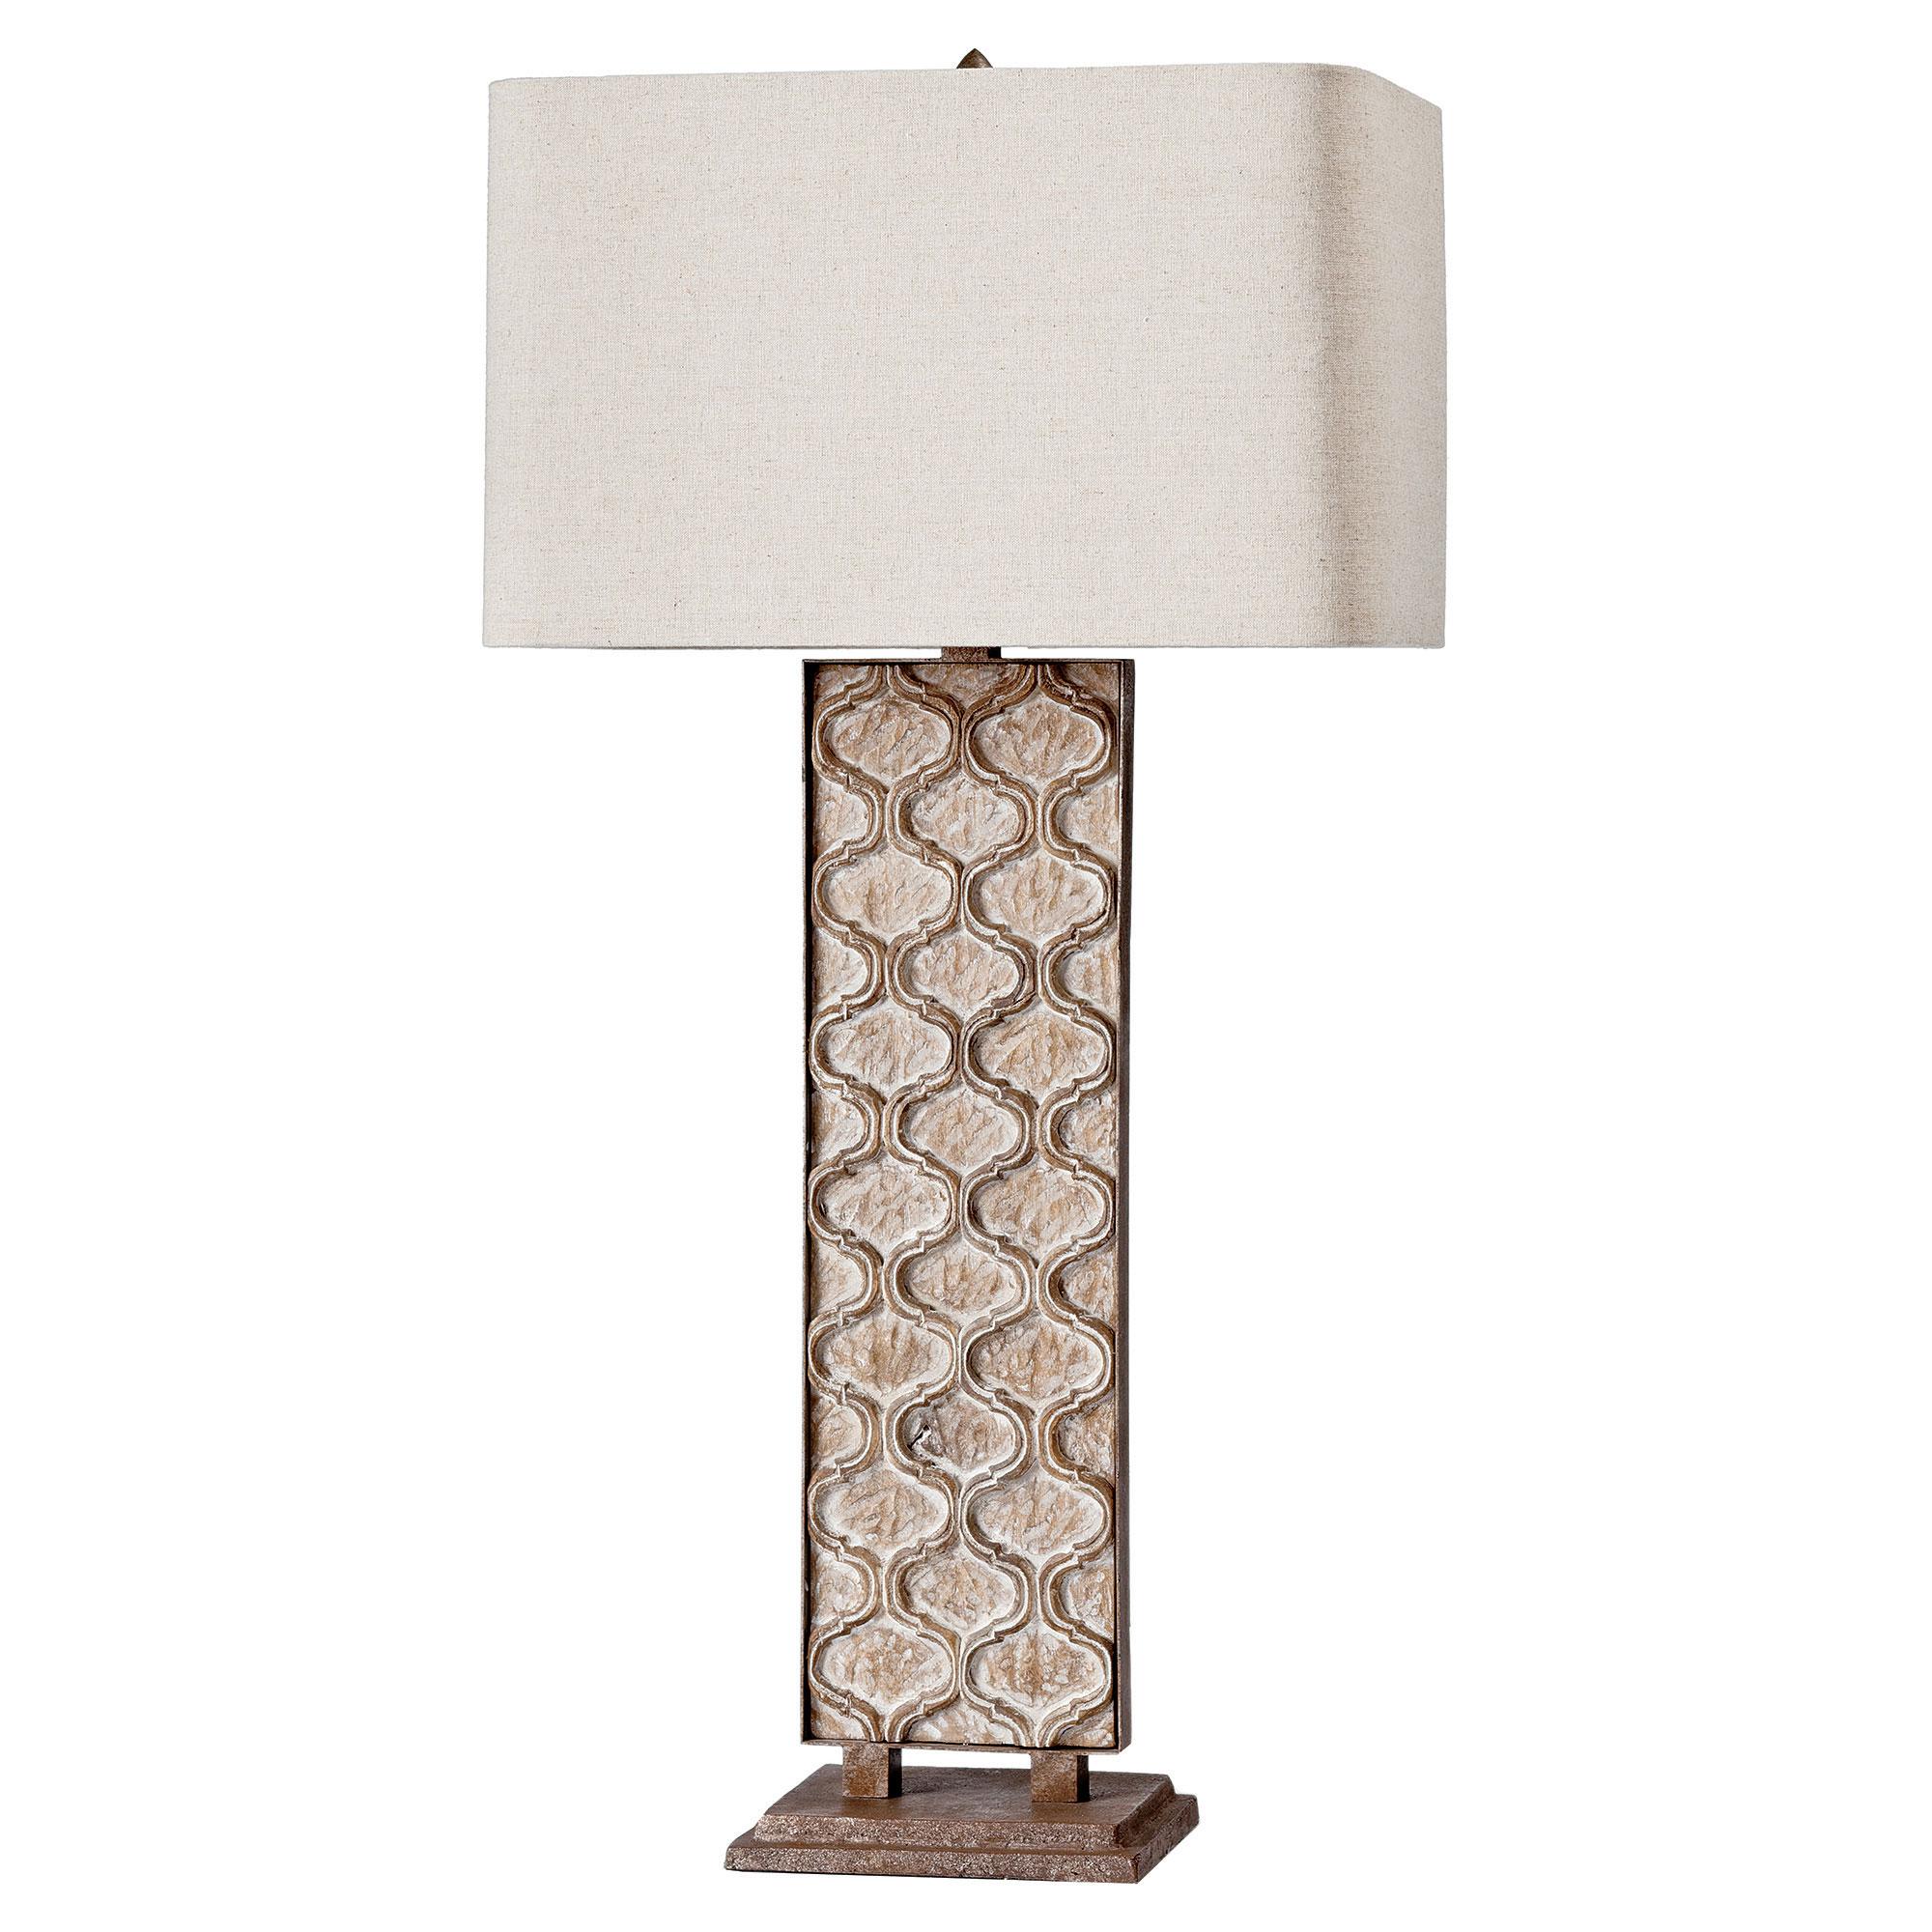 Sendak French Country Rustic Panel Table Lamp